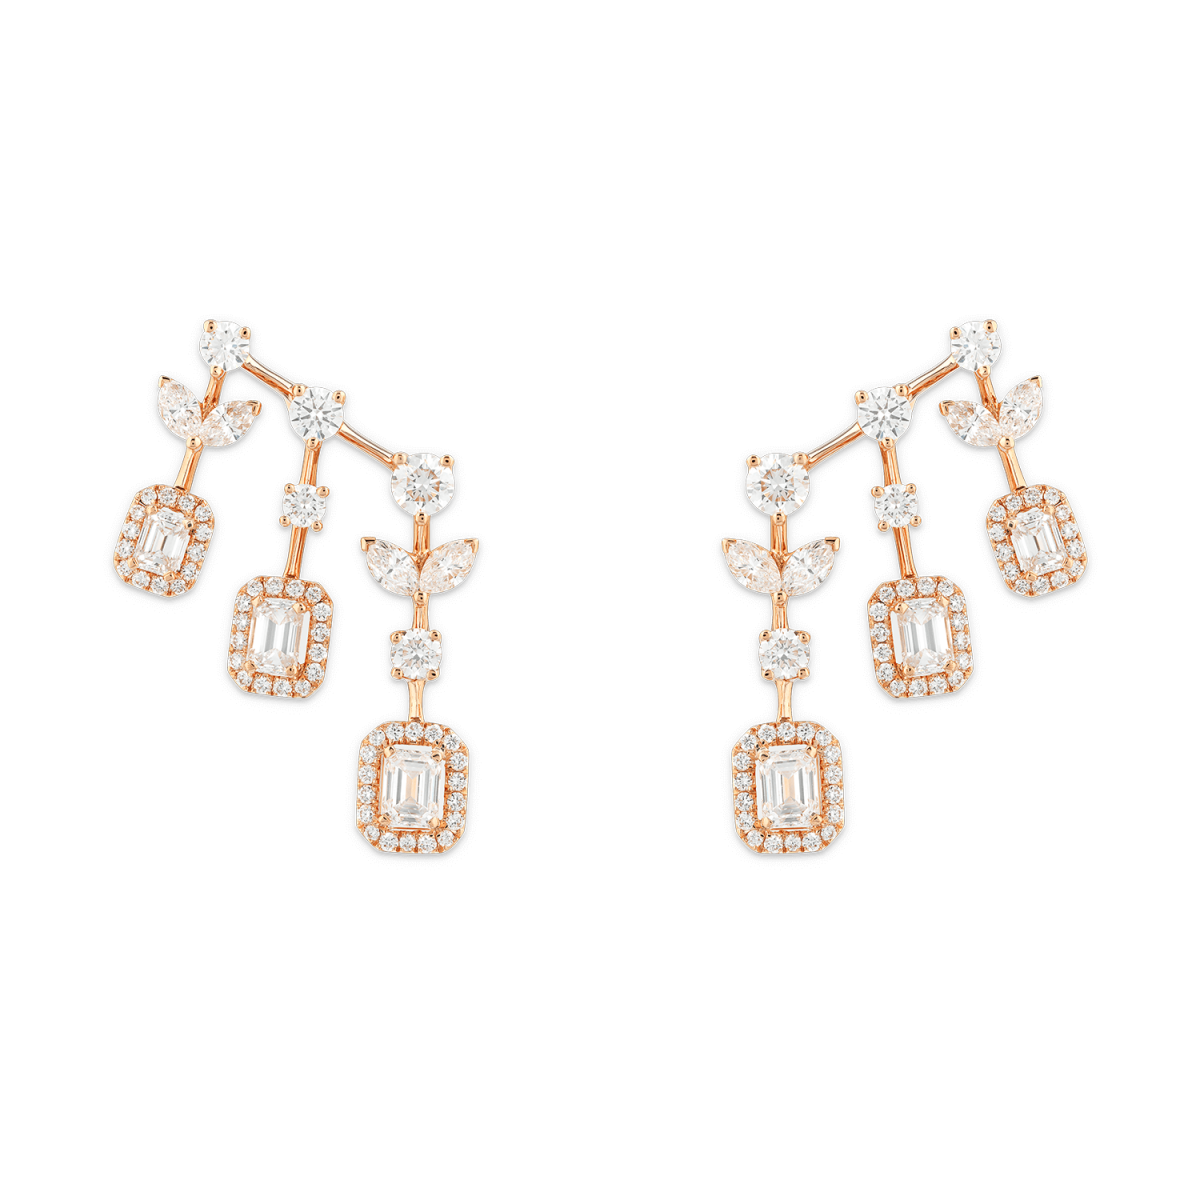 Sera Iconic Earrings